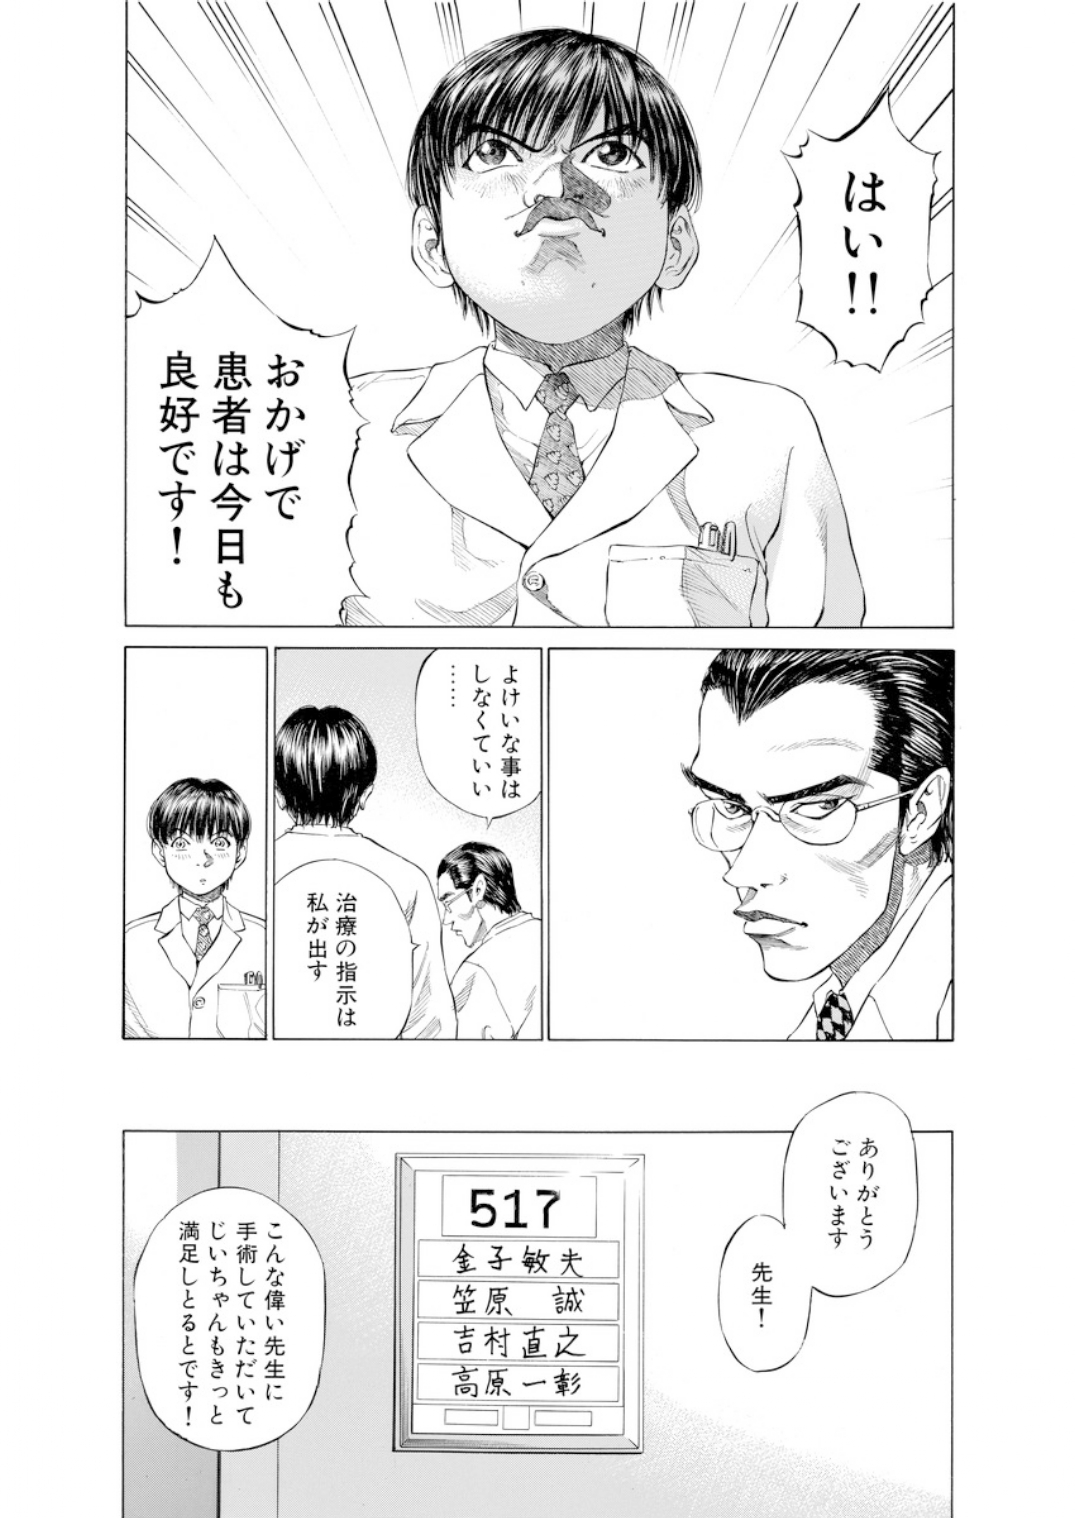 001bj_page-0090.jpg